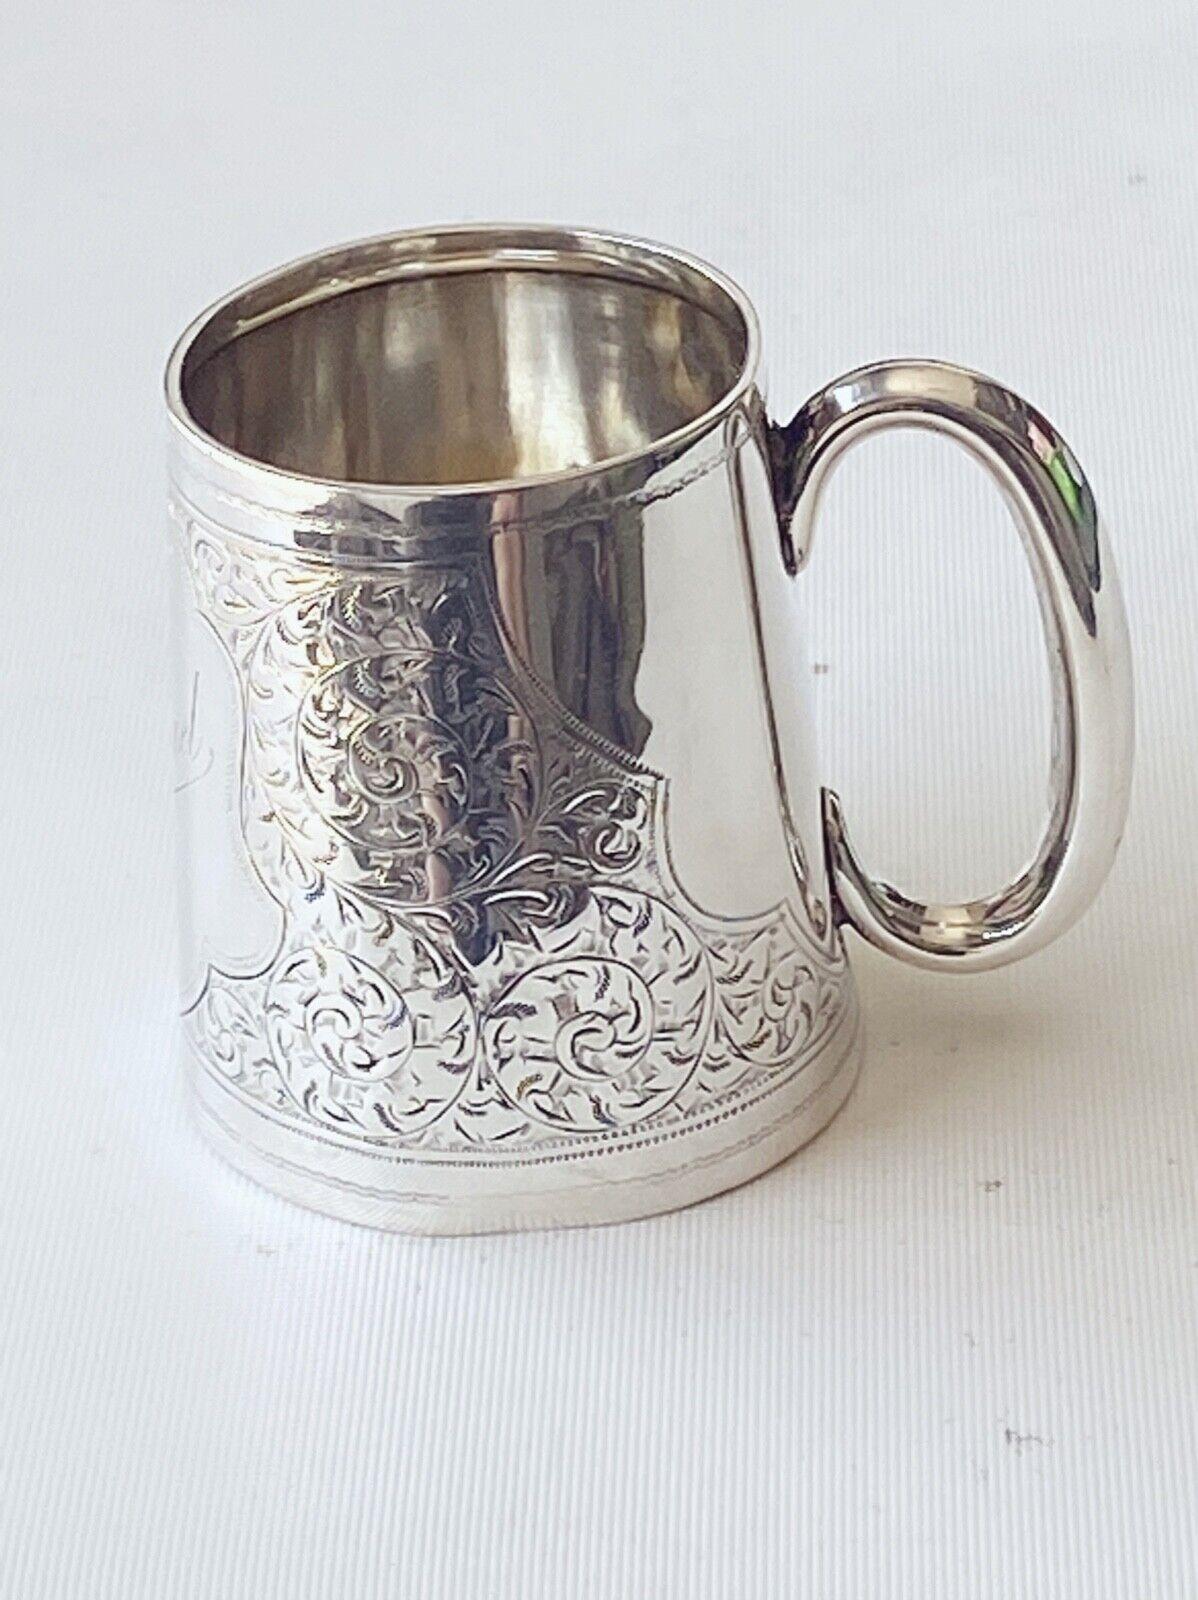 Vintage Engraved Sterling Silver Baptism Cup Birmingham 1910. Engraved Michael,  - $129.00